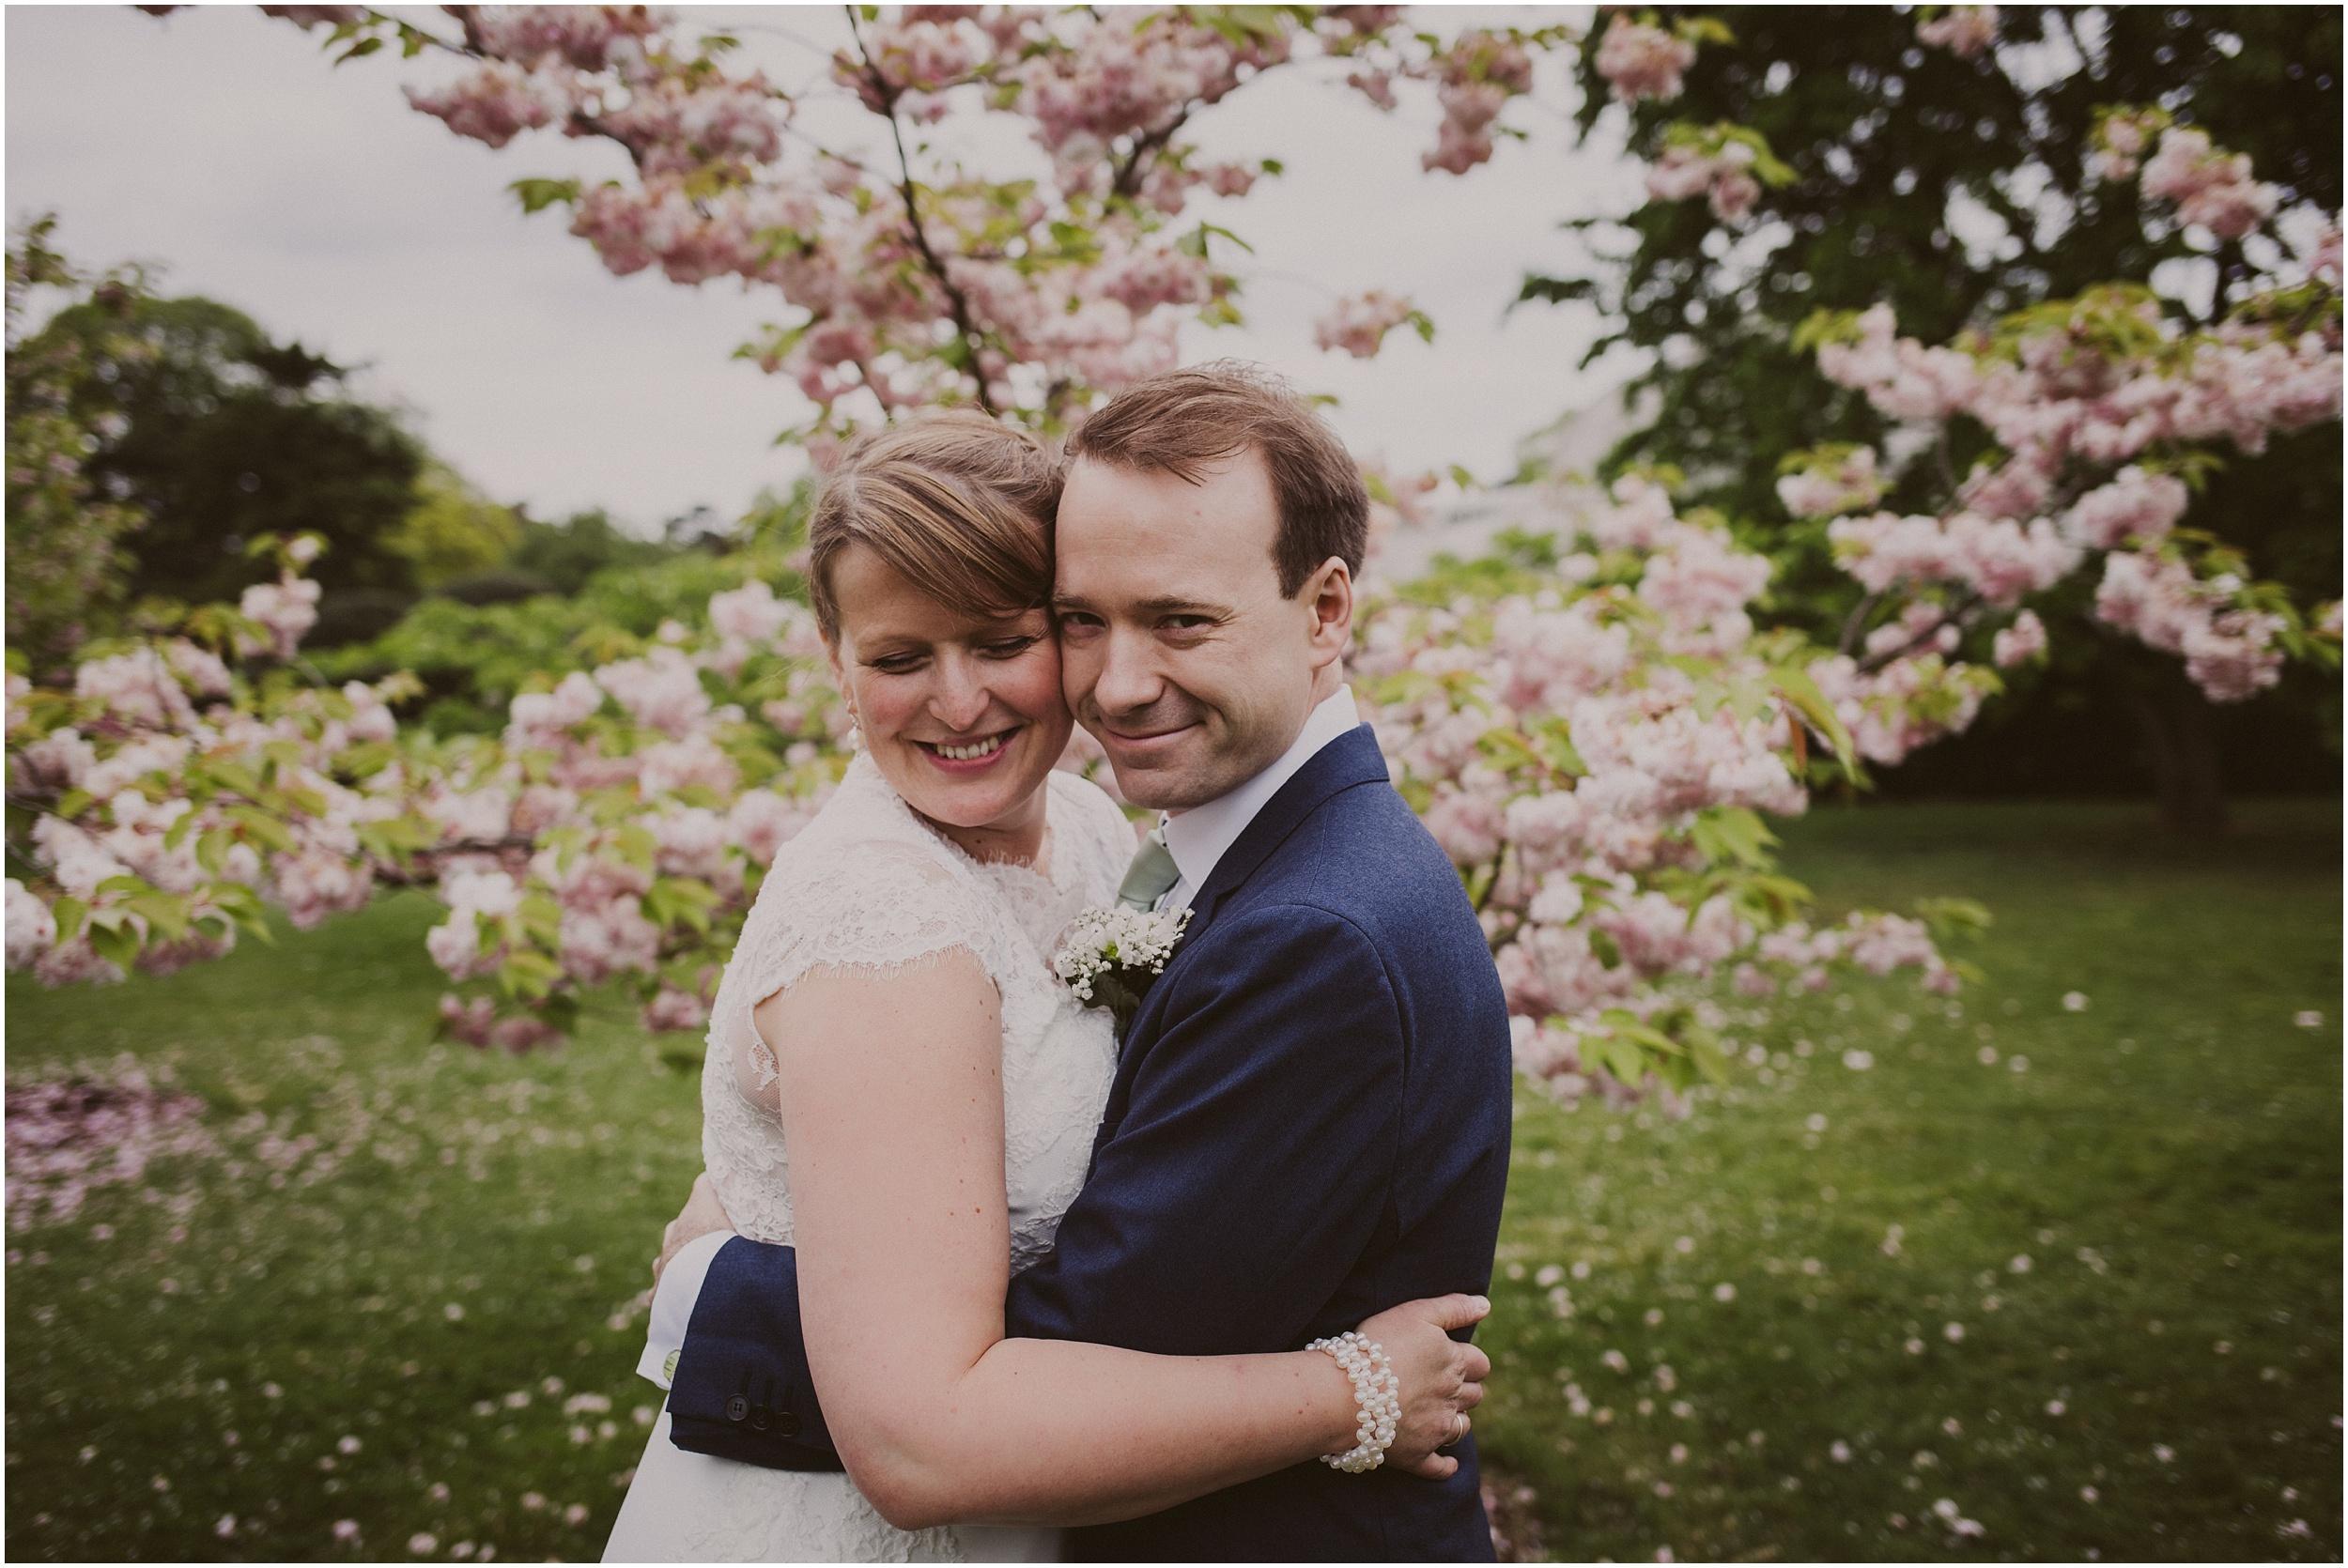 4-Libby&Tim_portraits-16.jpg